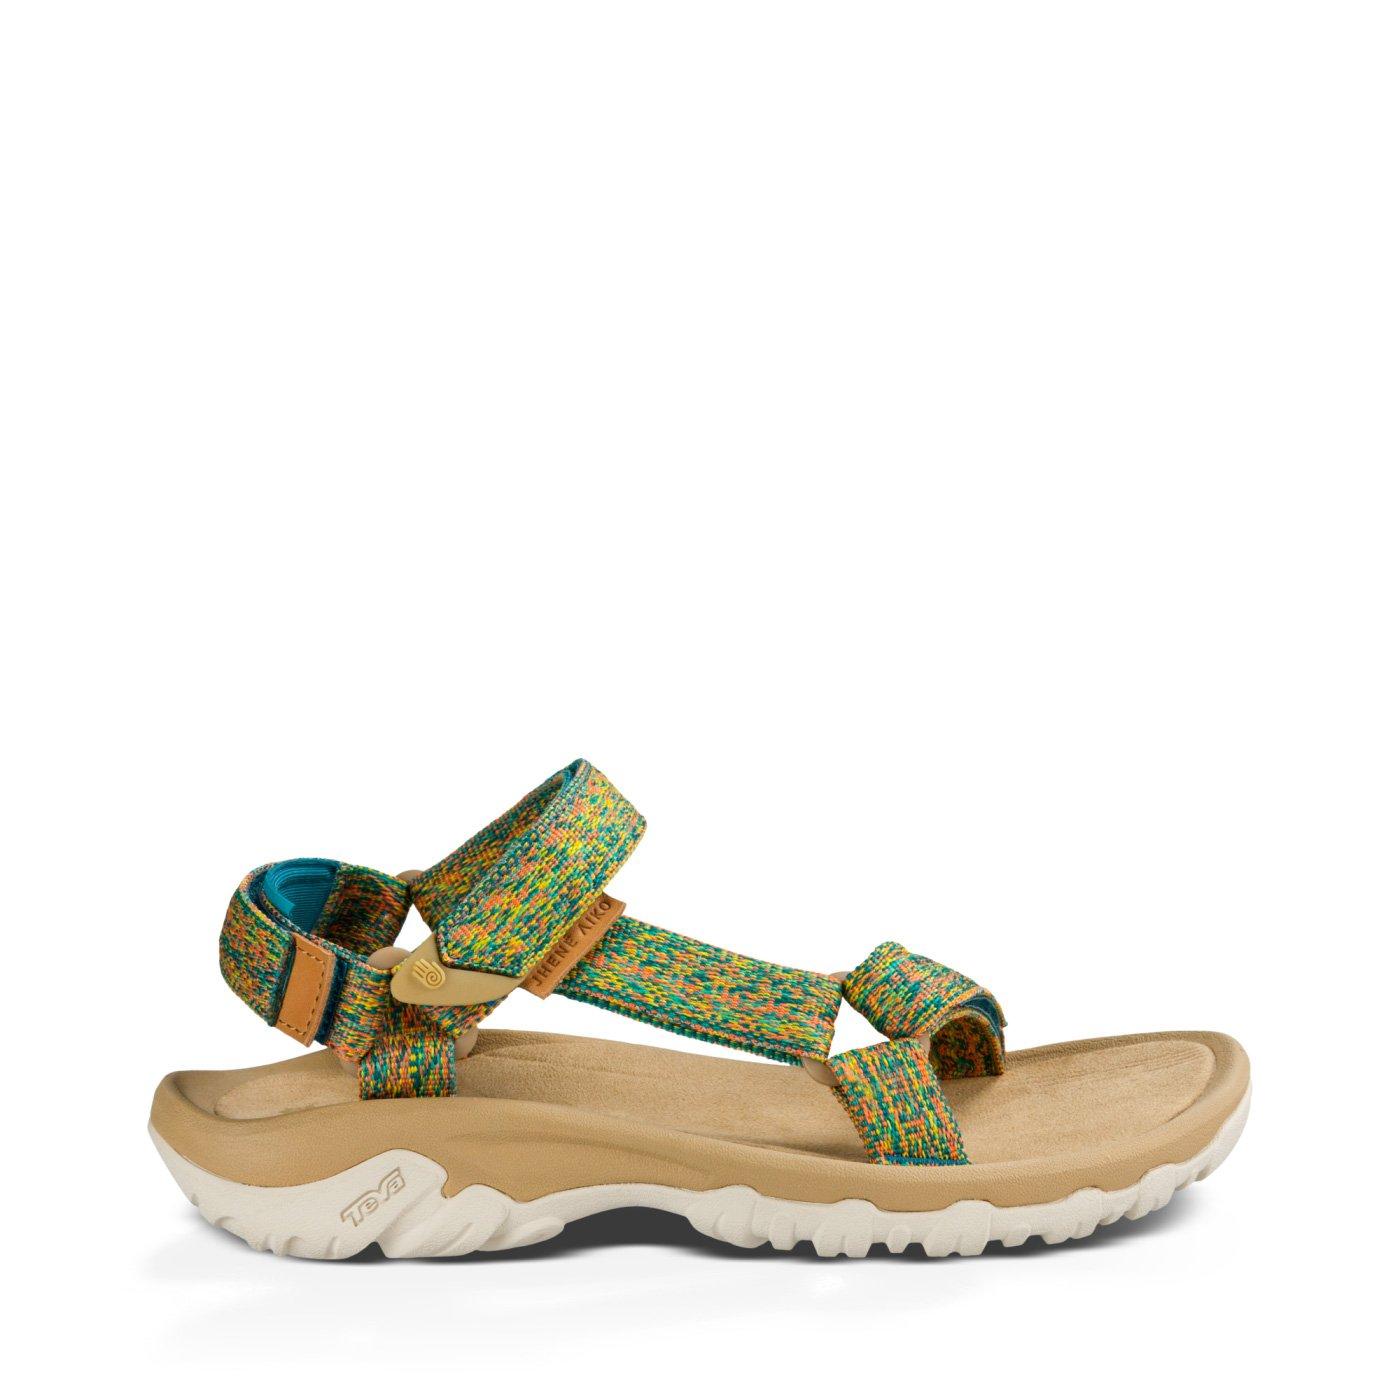 Teva Womens Hurricane XLT Jhene Aiko Sandal Shoes, Space Dye with Teal, US 5 B01N6ZMSYN Parent